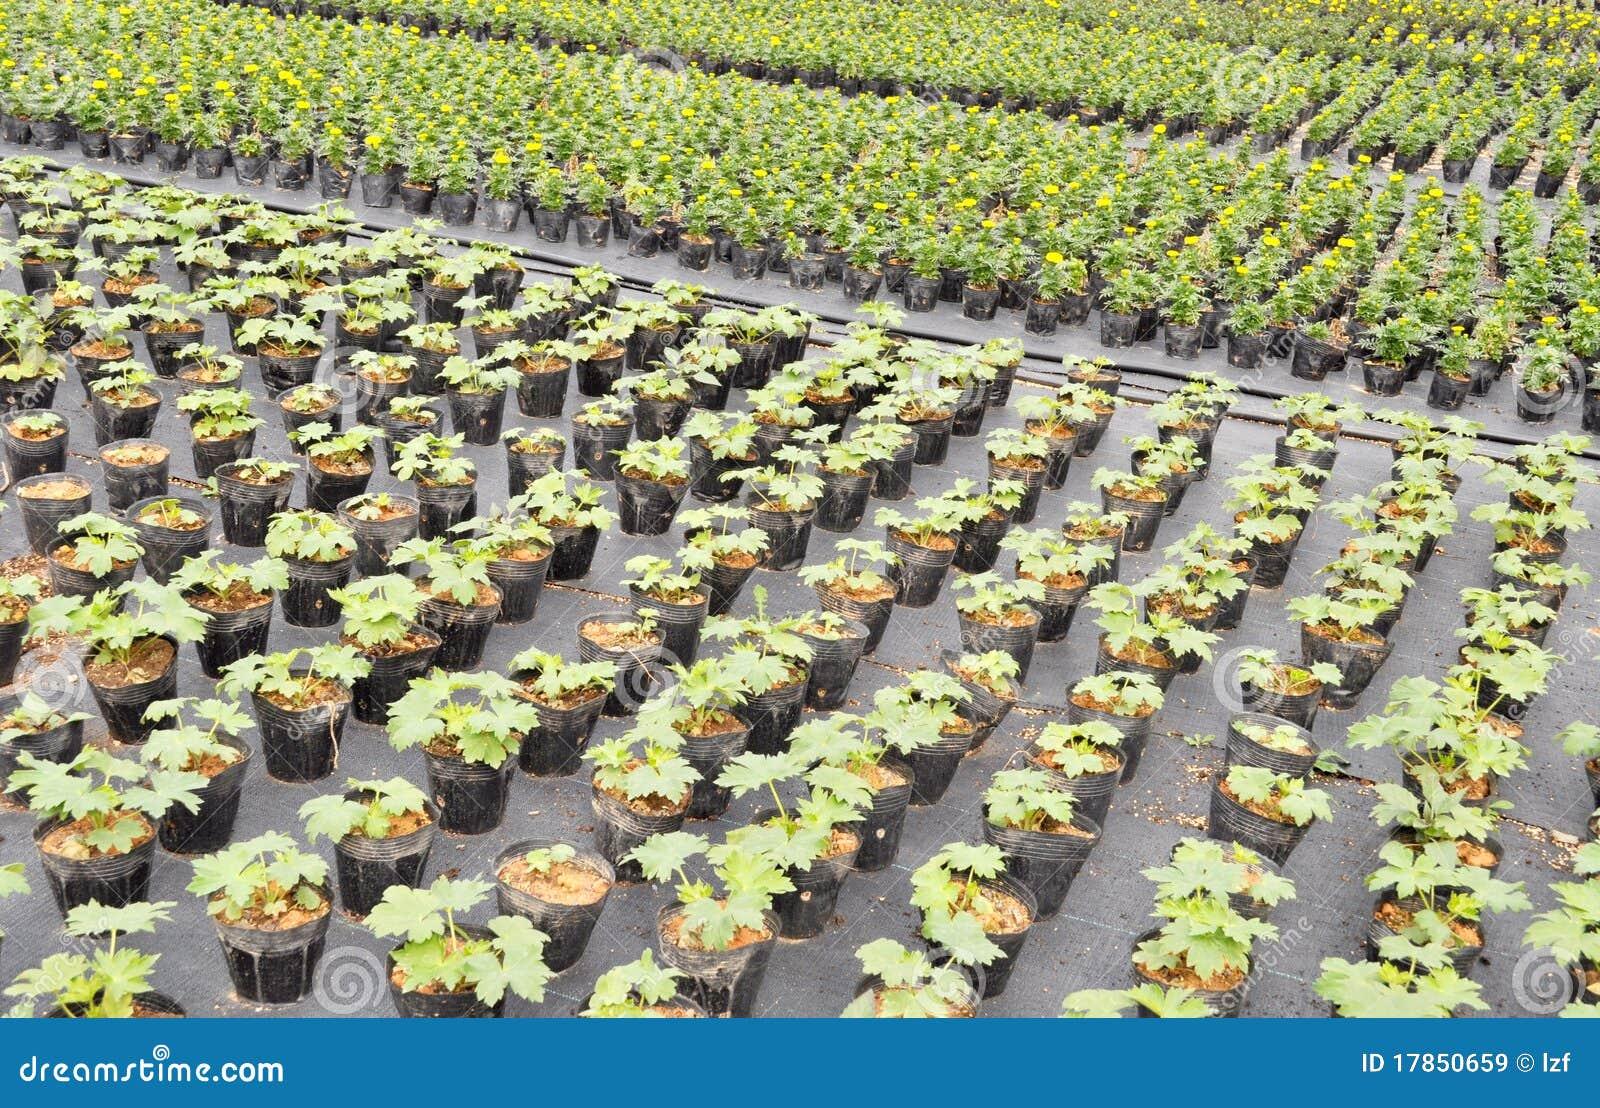 Marigold Seedling Stock Image Image Of Line Farm Garden 17850659